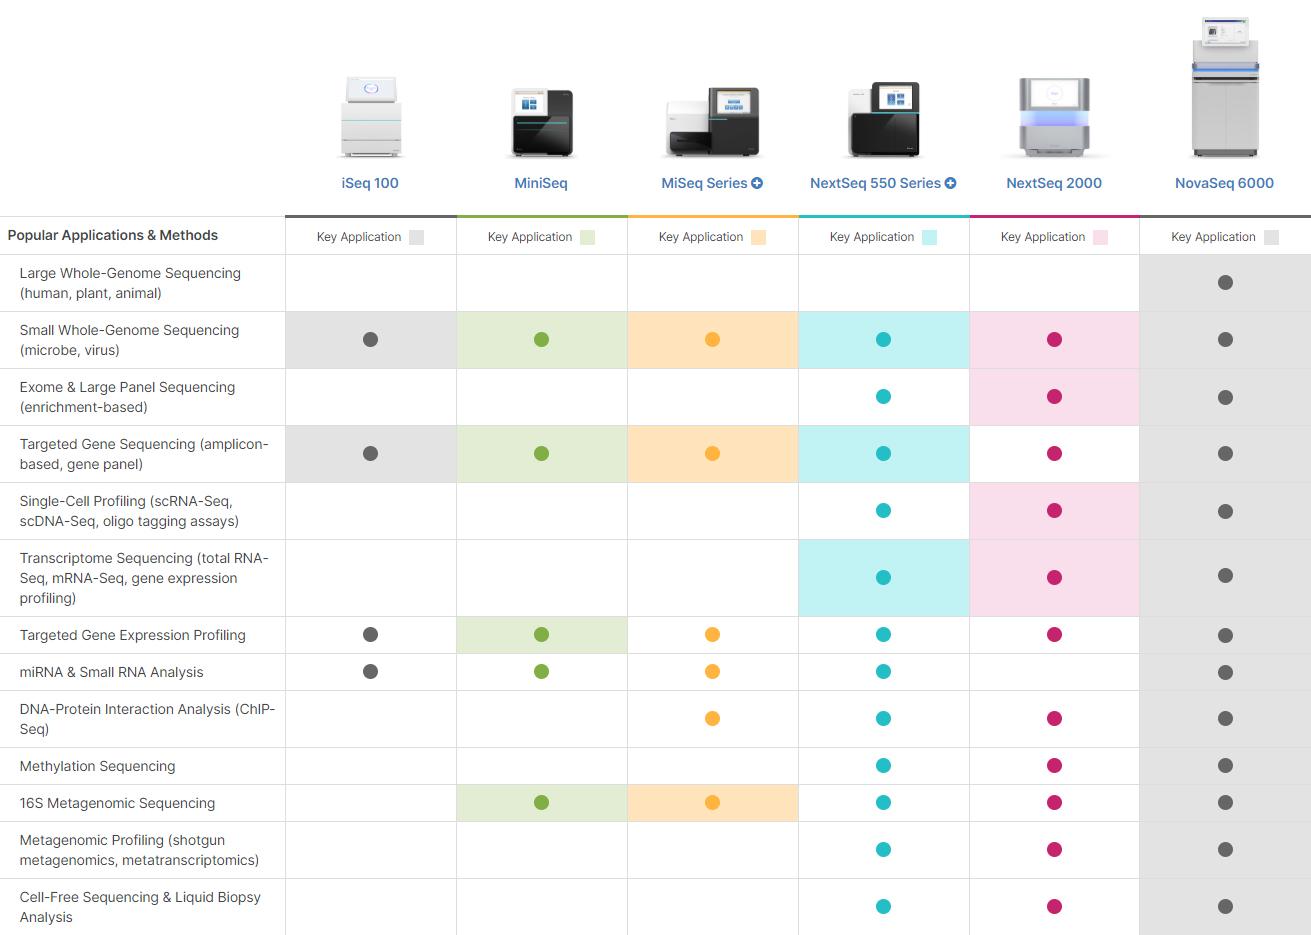 Illumina sequencing platforms